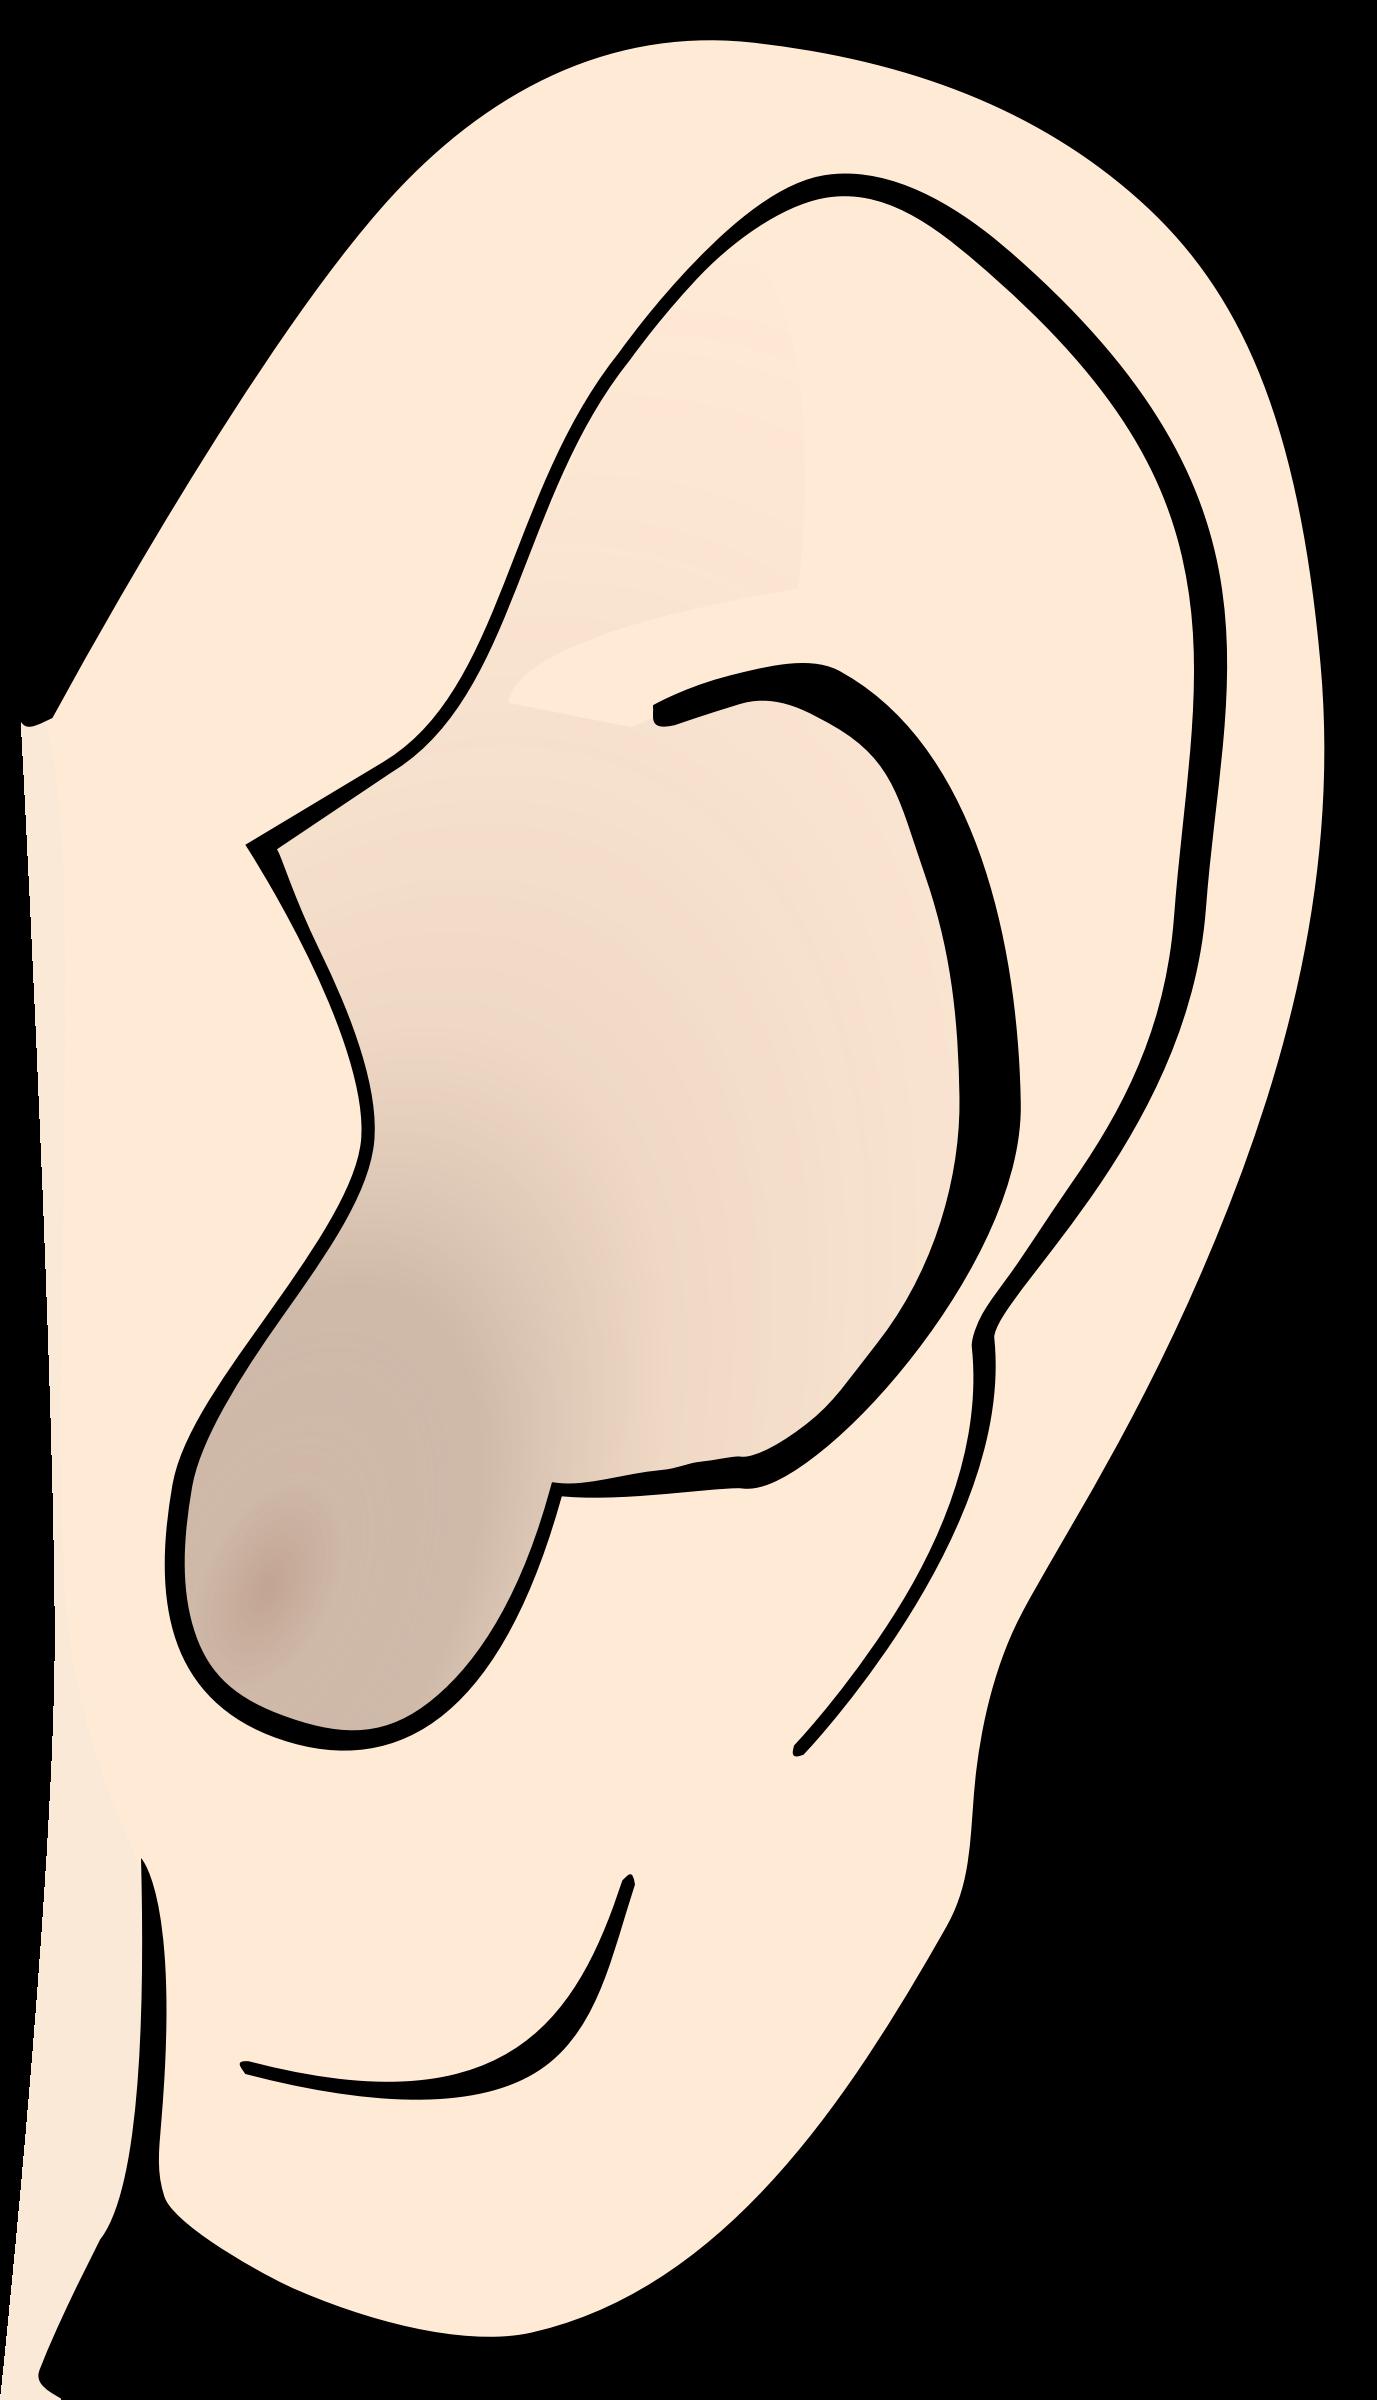 ear clipart clip art free borders image 2